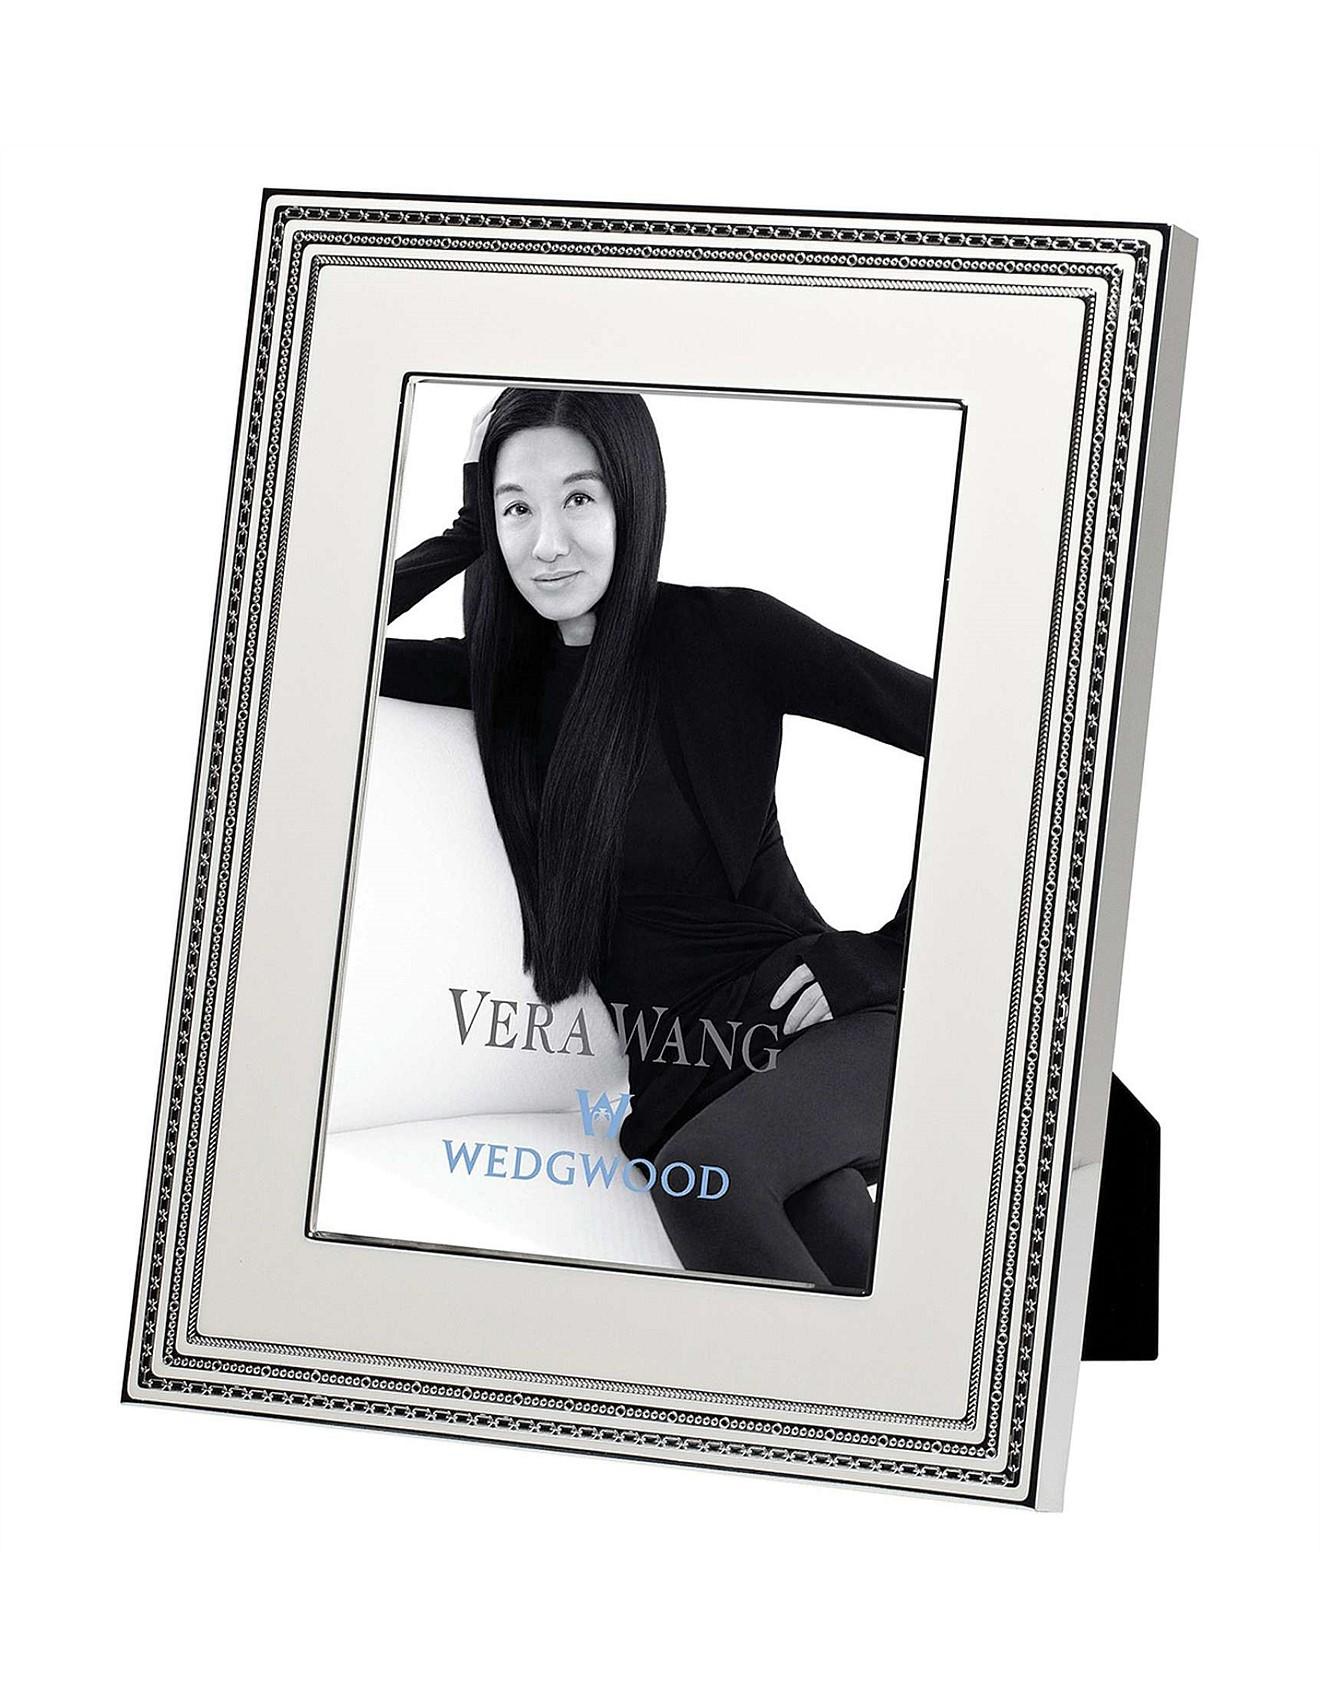 Wedgwood   Buy Wedgwood Homewares Online   David Jones - Vera Wang ...